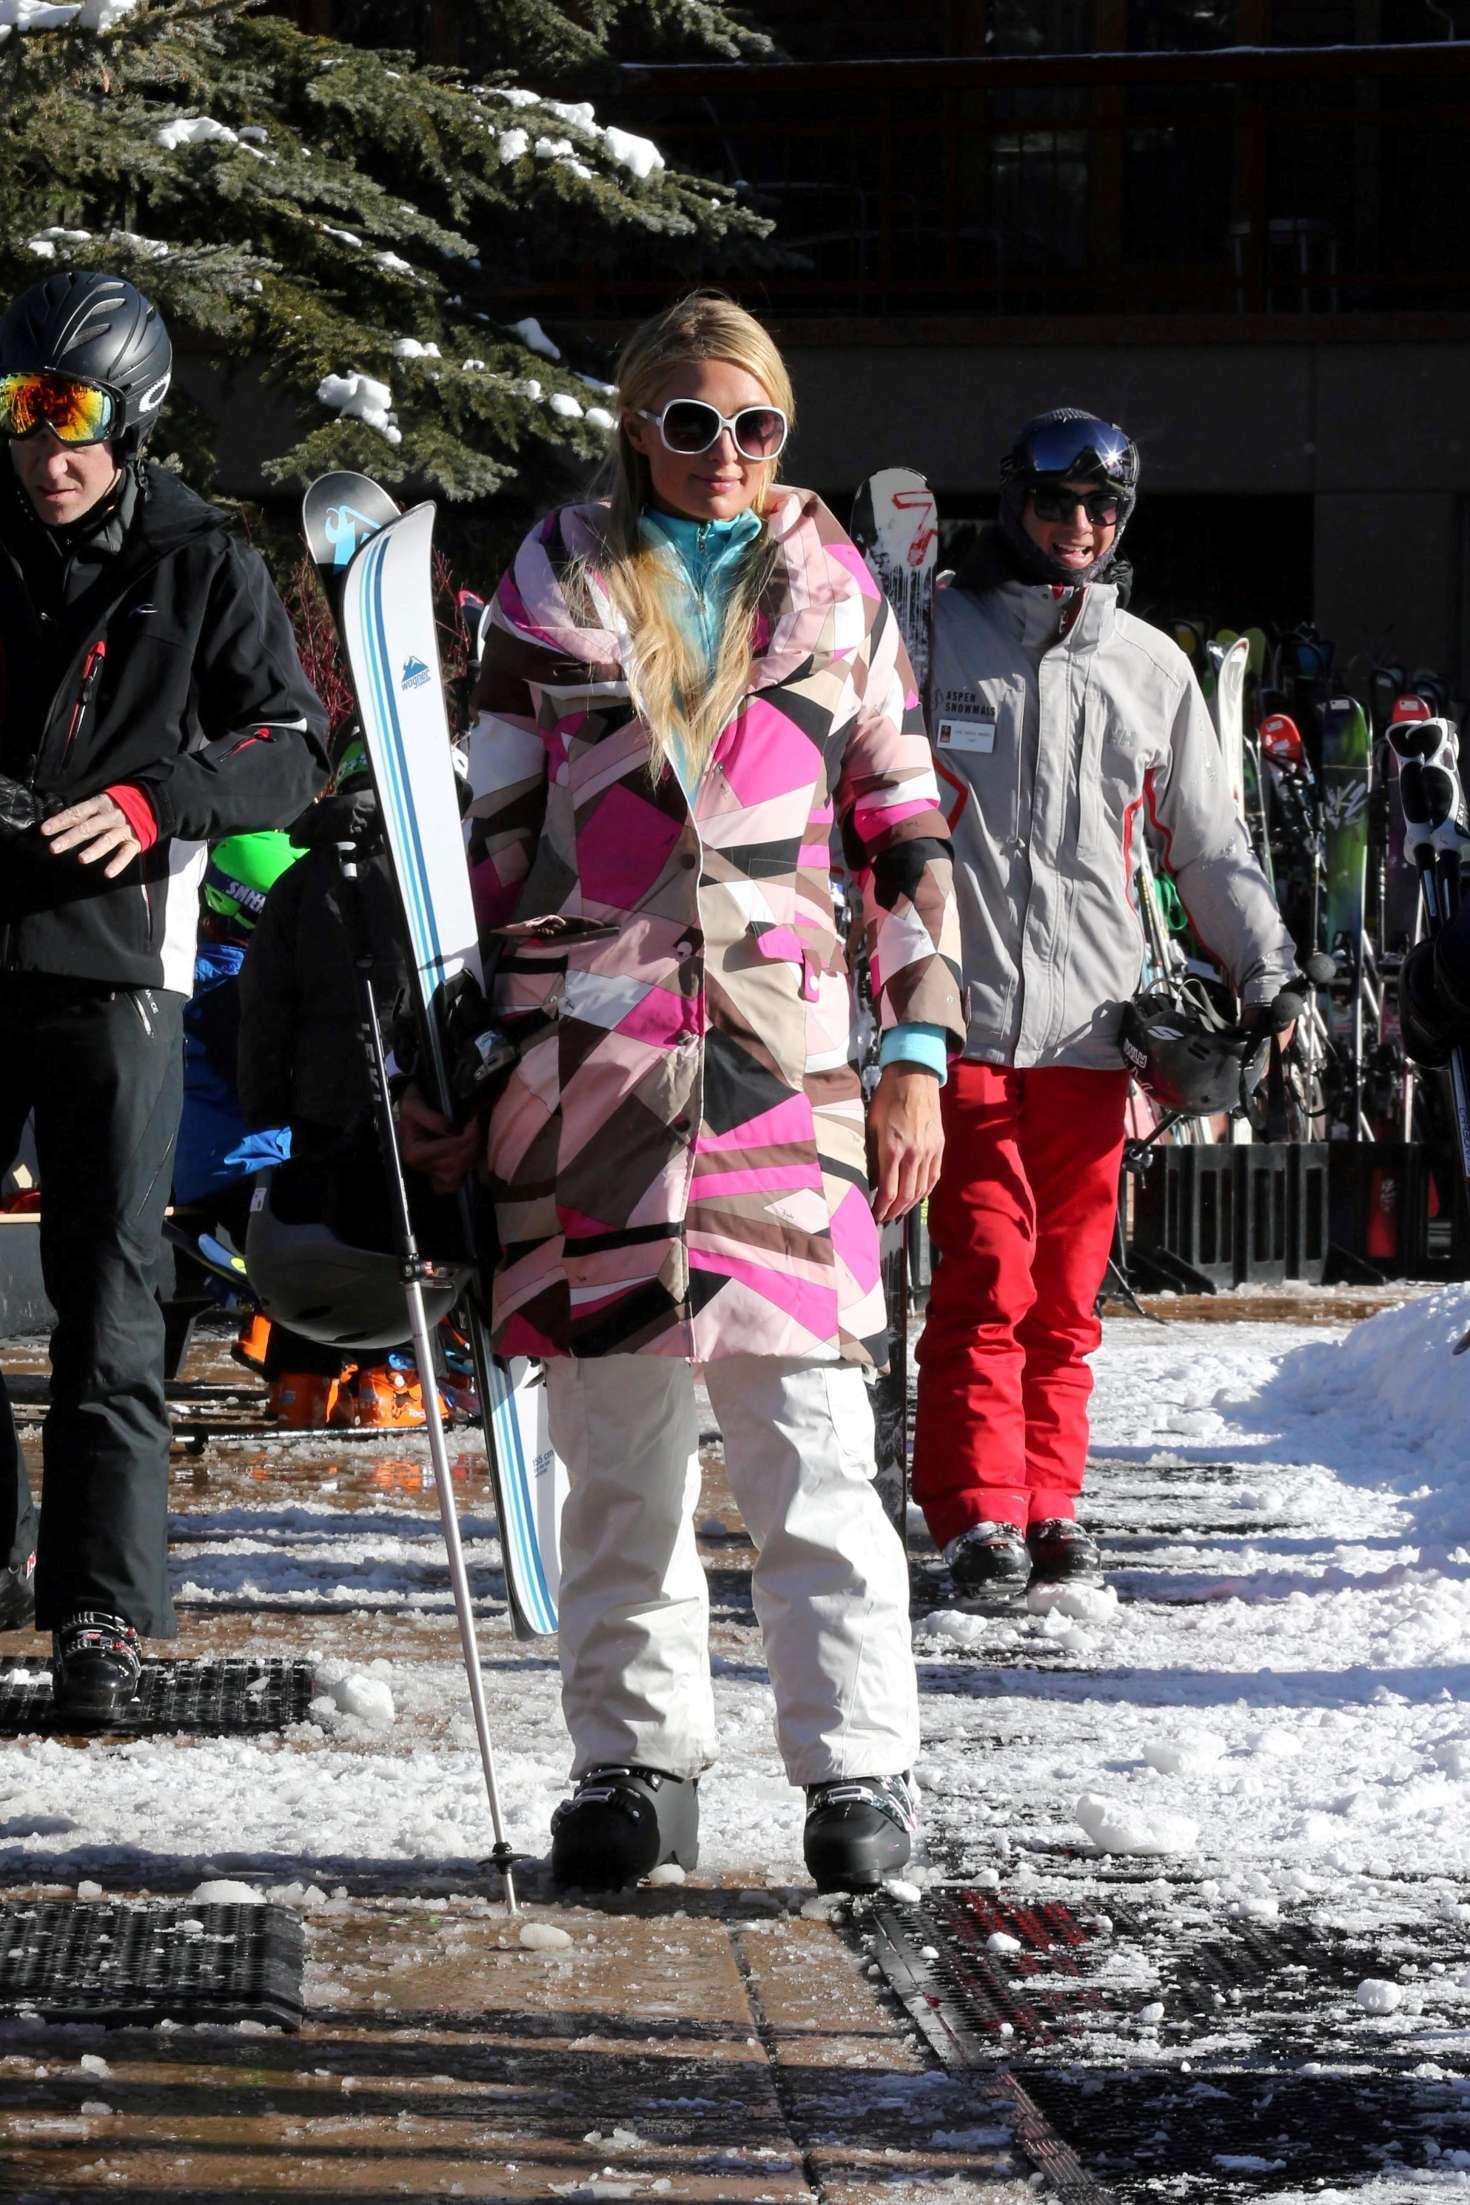 Paris Hilton 2016 : Paris Hilton Skiing in Aspen -34